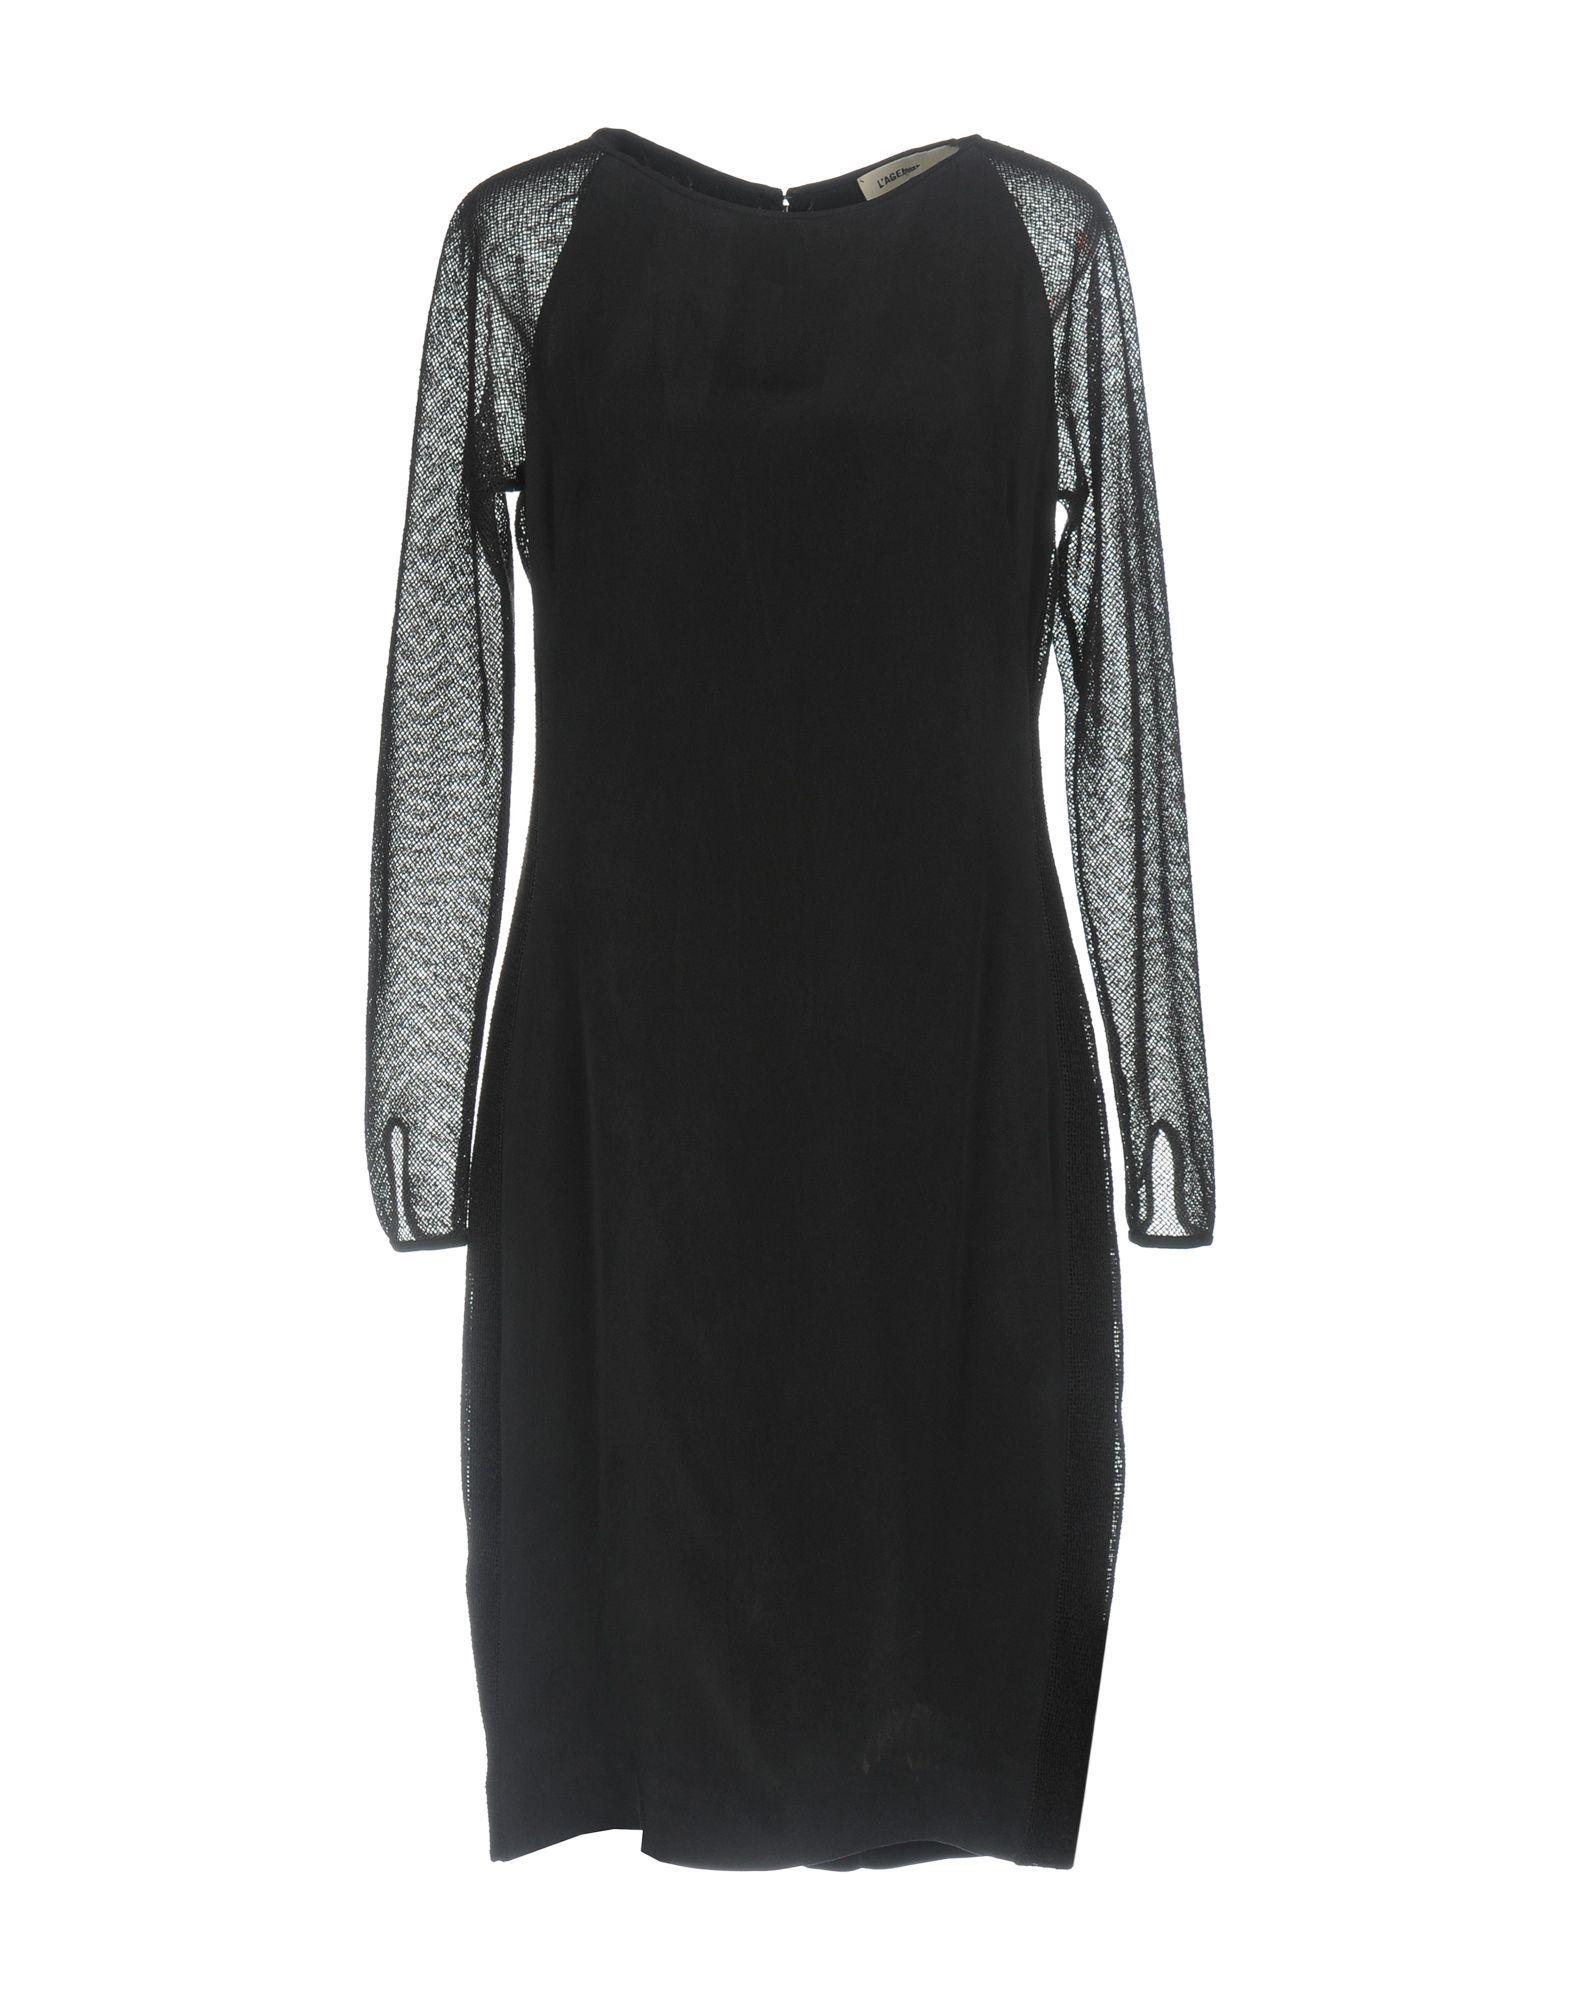 L'Agence Black Silk Knit Long Sleeve Dress